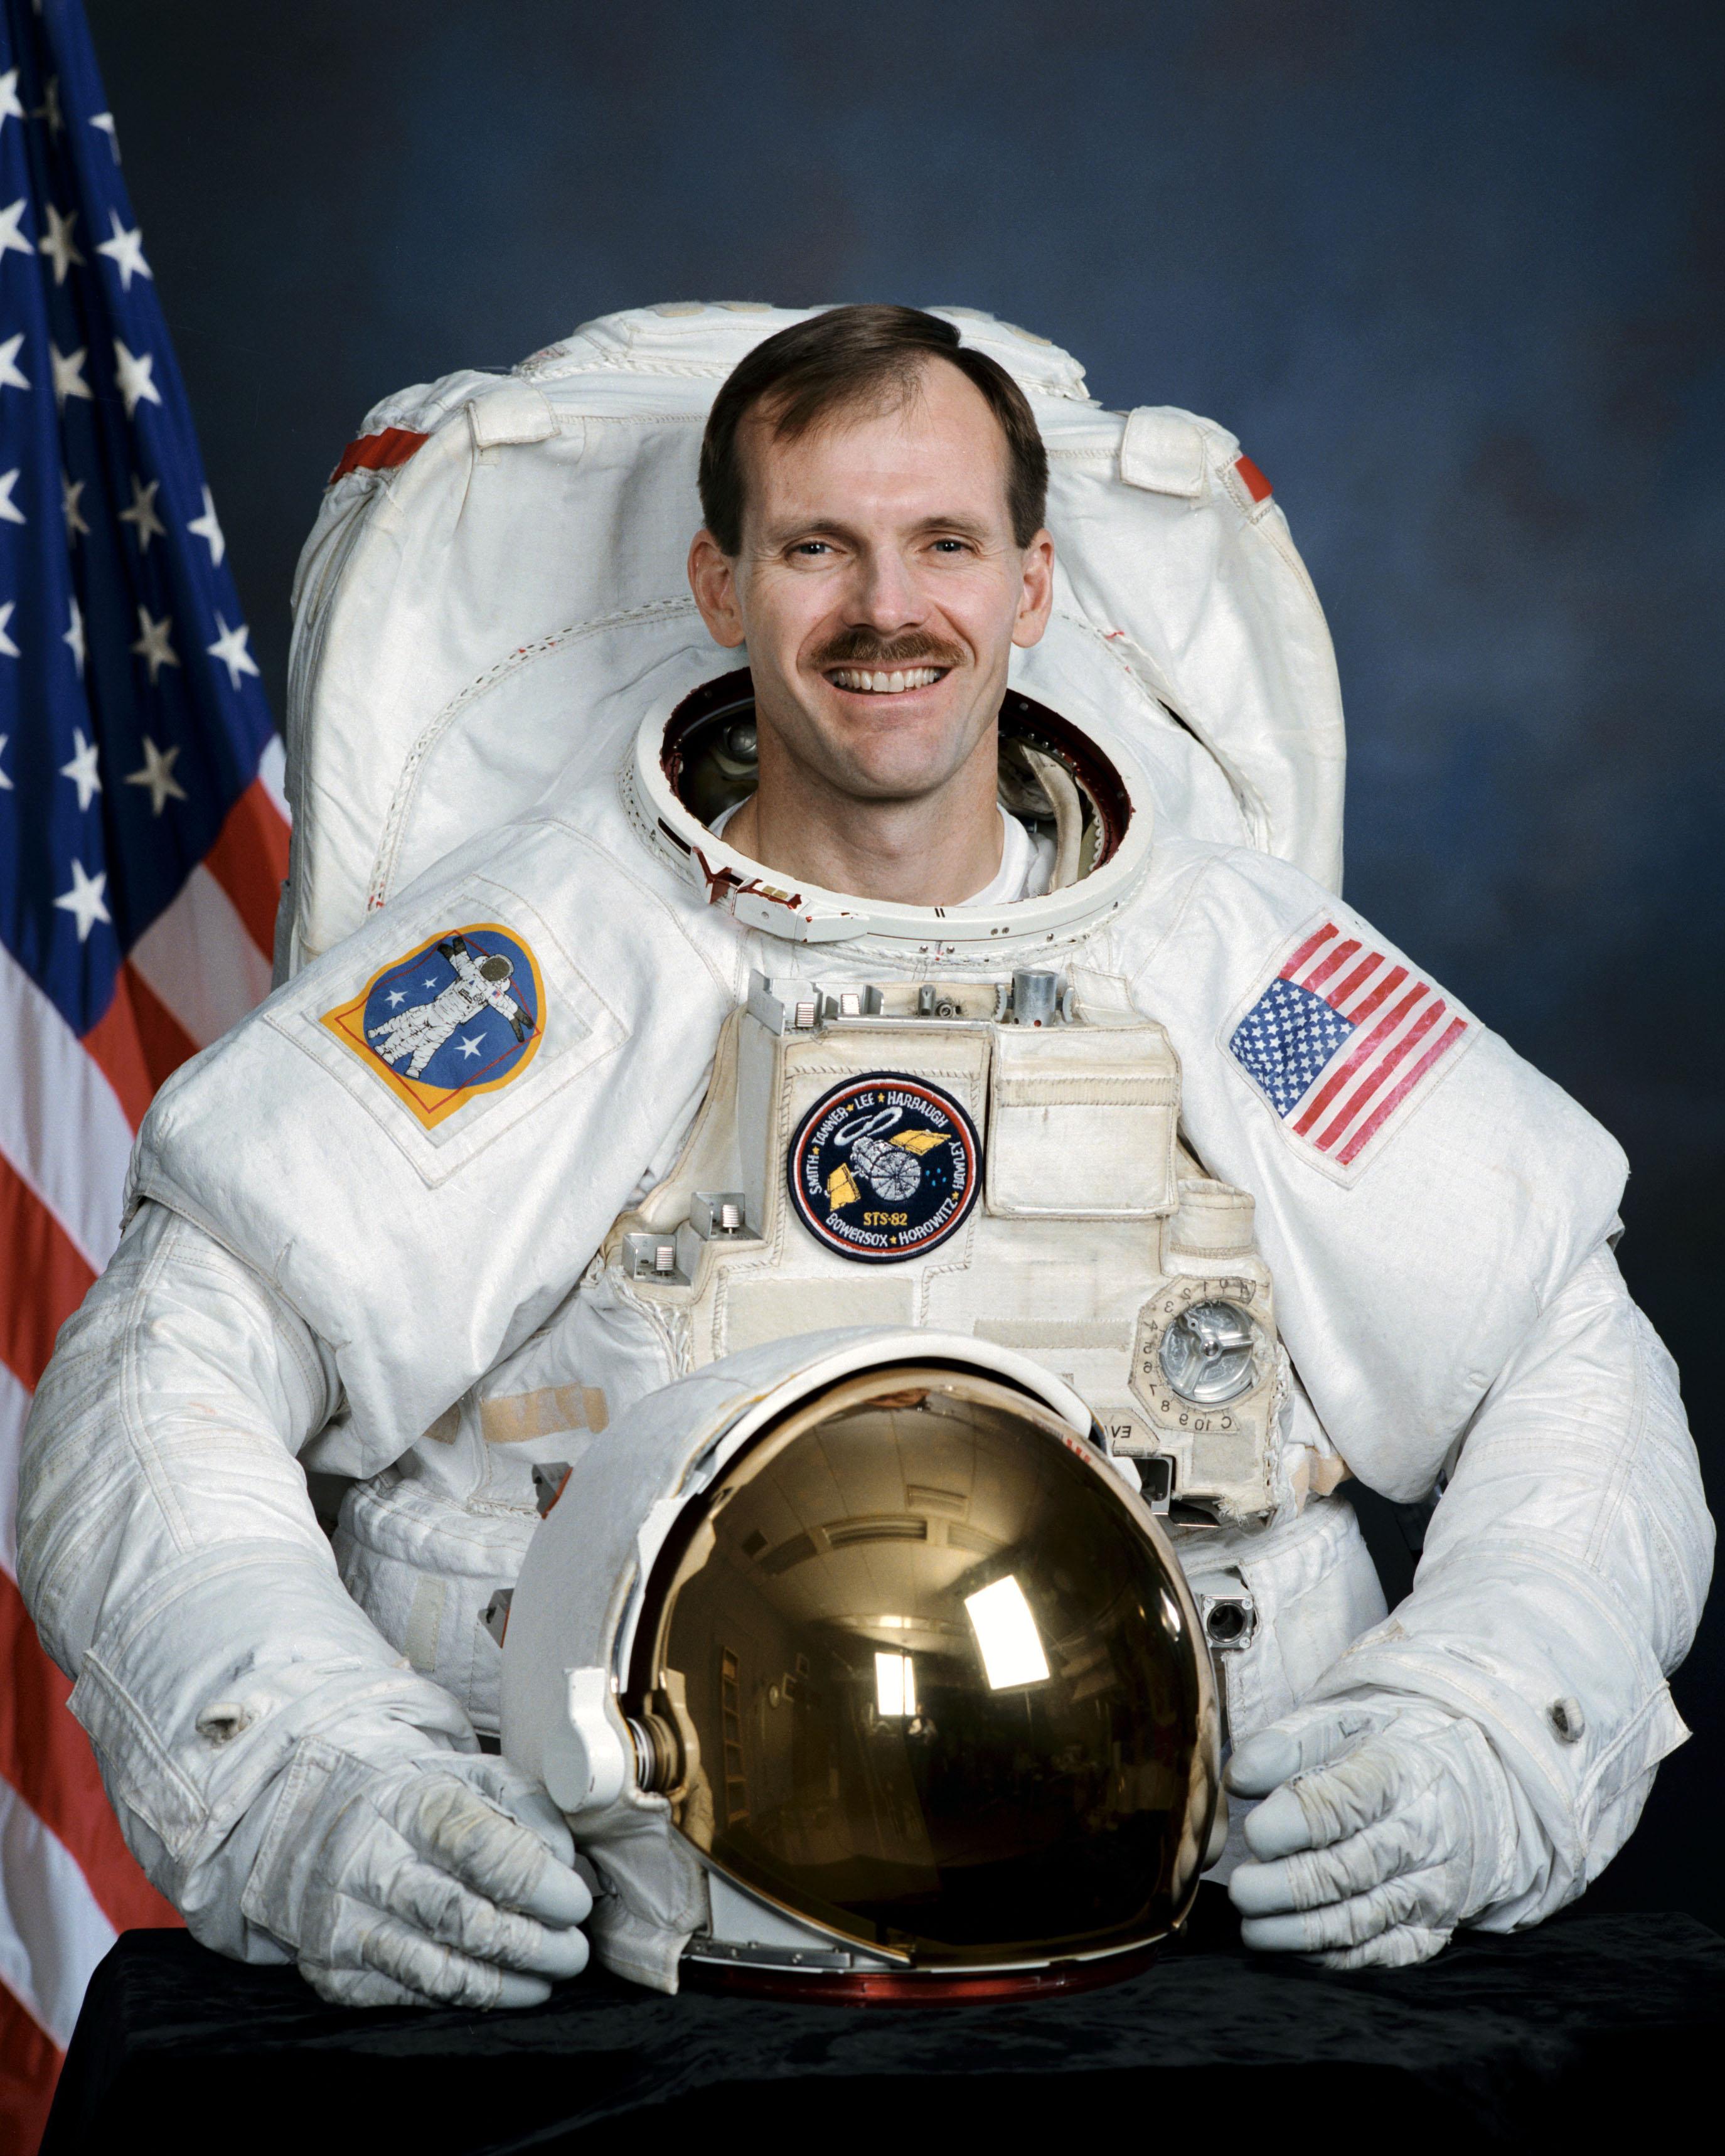 image of Steven Smith